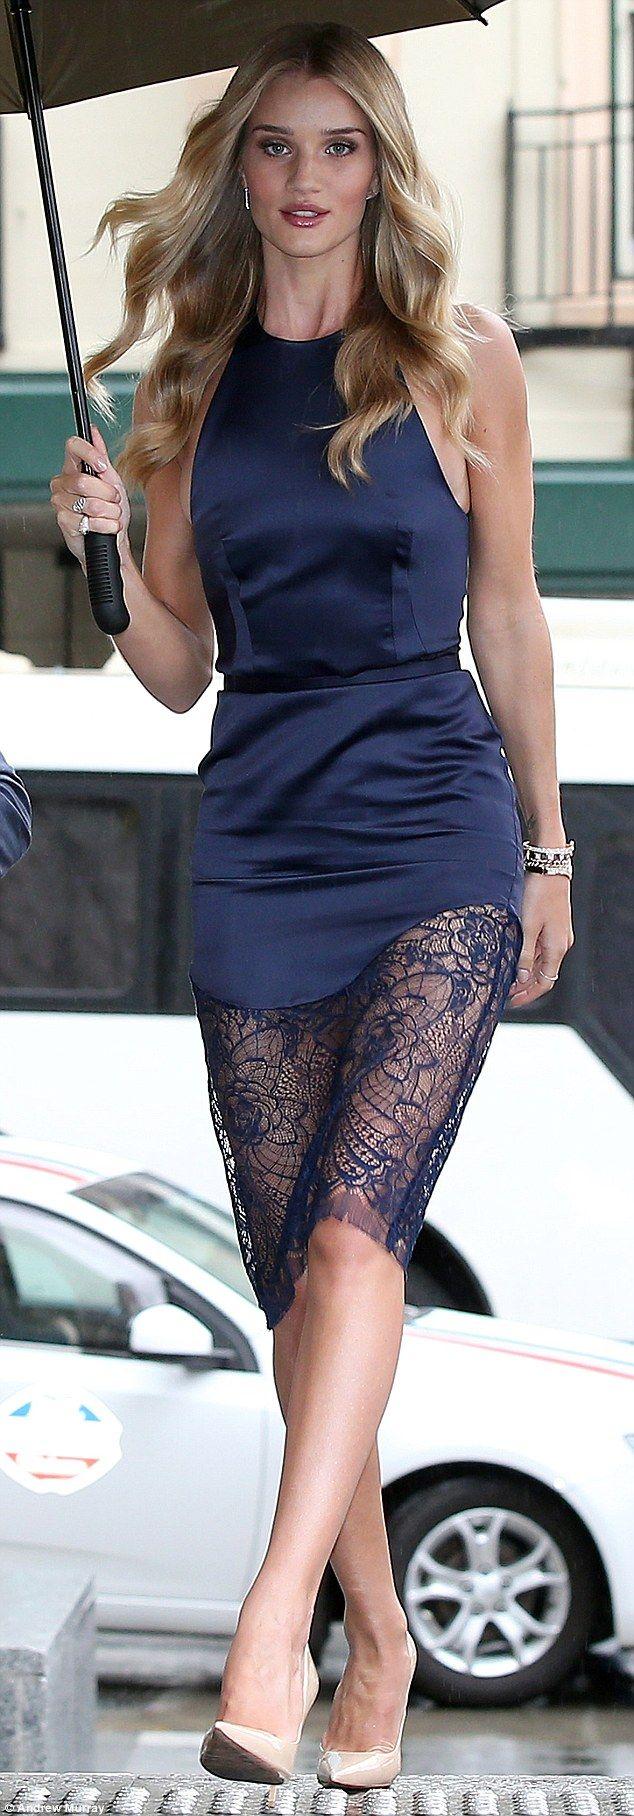 Rosie Huntington-Whiteley stunning at ModelCo skincare launch #dailymail